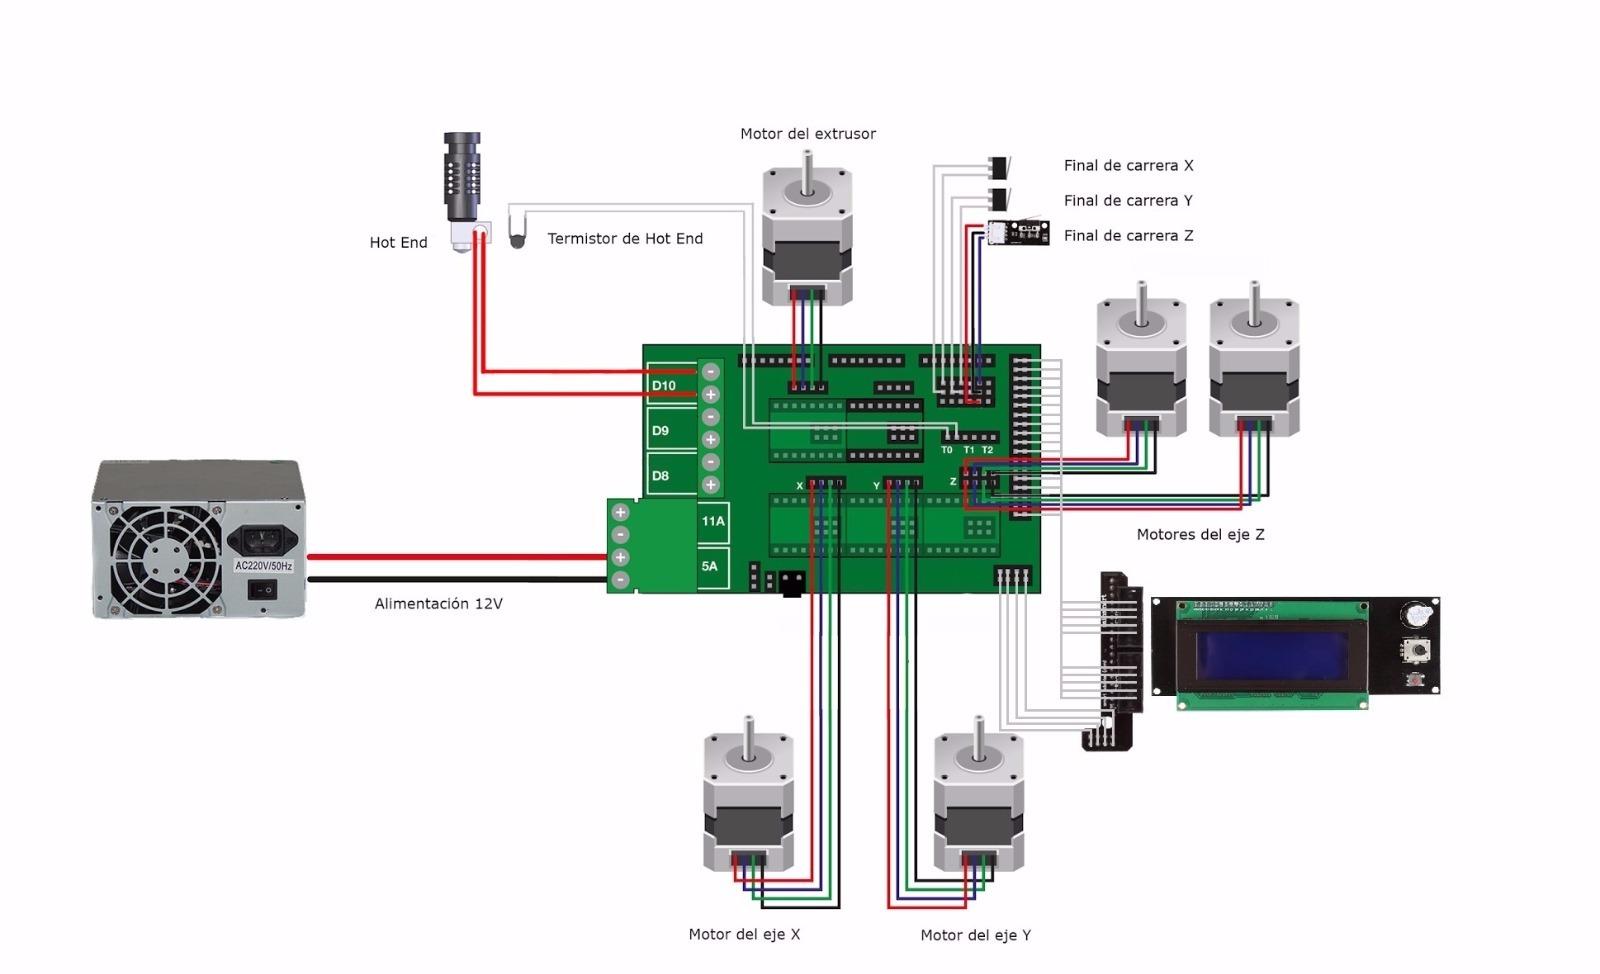 Circuito Bluetooth Casero : Grupo 4 madrid impresora 3d casera diseño de sistemas empotrados